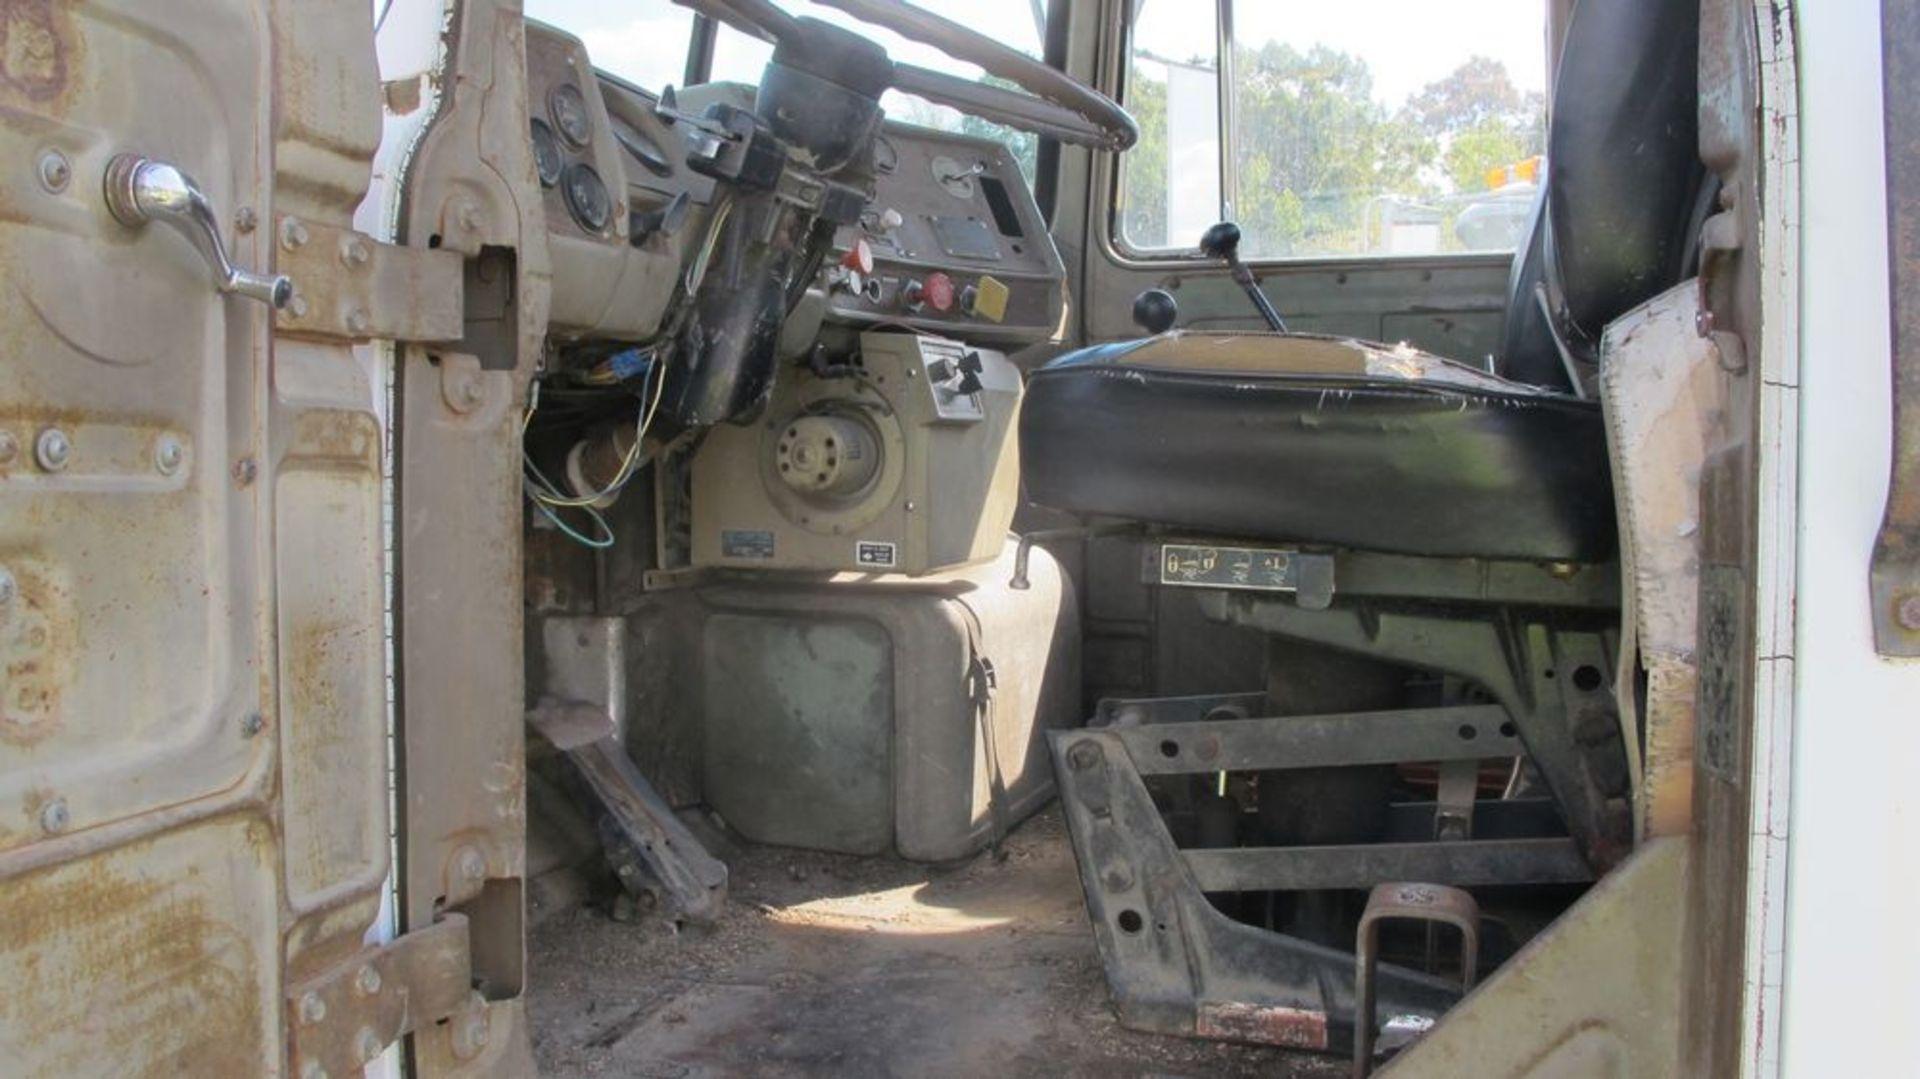 Lot 11 - GREY MACK TRACTOR RD6885 YARD TRUCK, VIN 1M2P267Y9XMC47498 (RUNNING) (WAREHOUSE 30 - PARKING LOT)